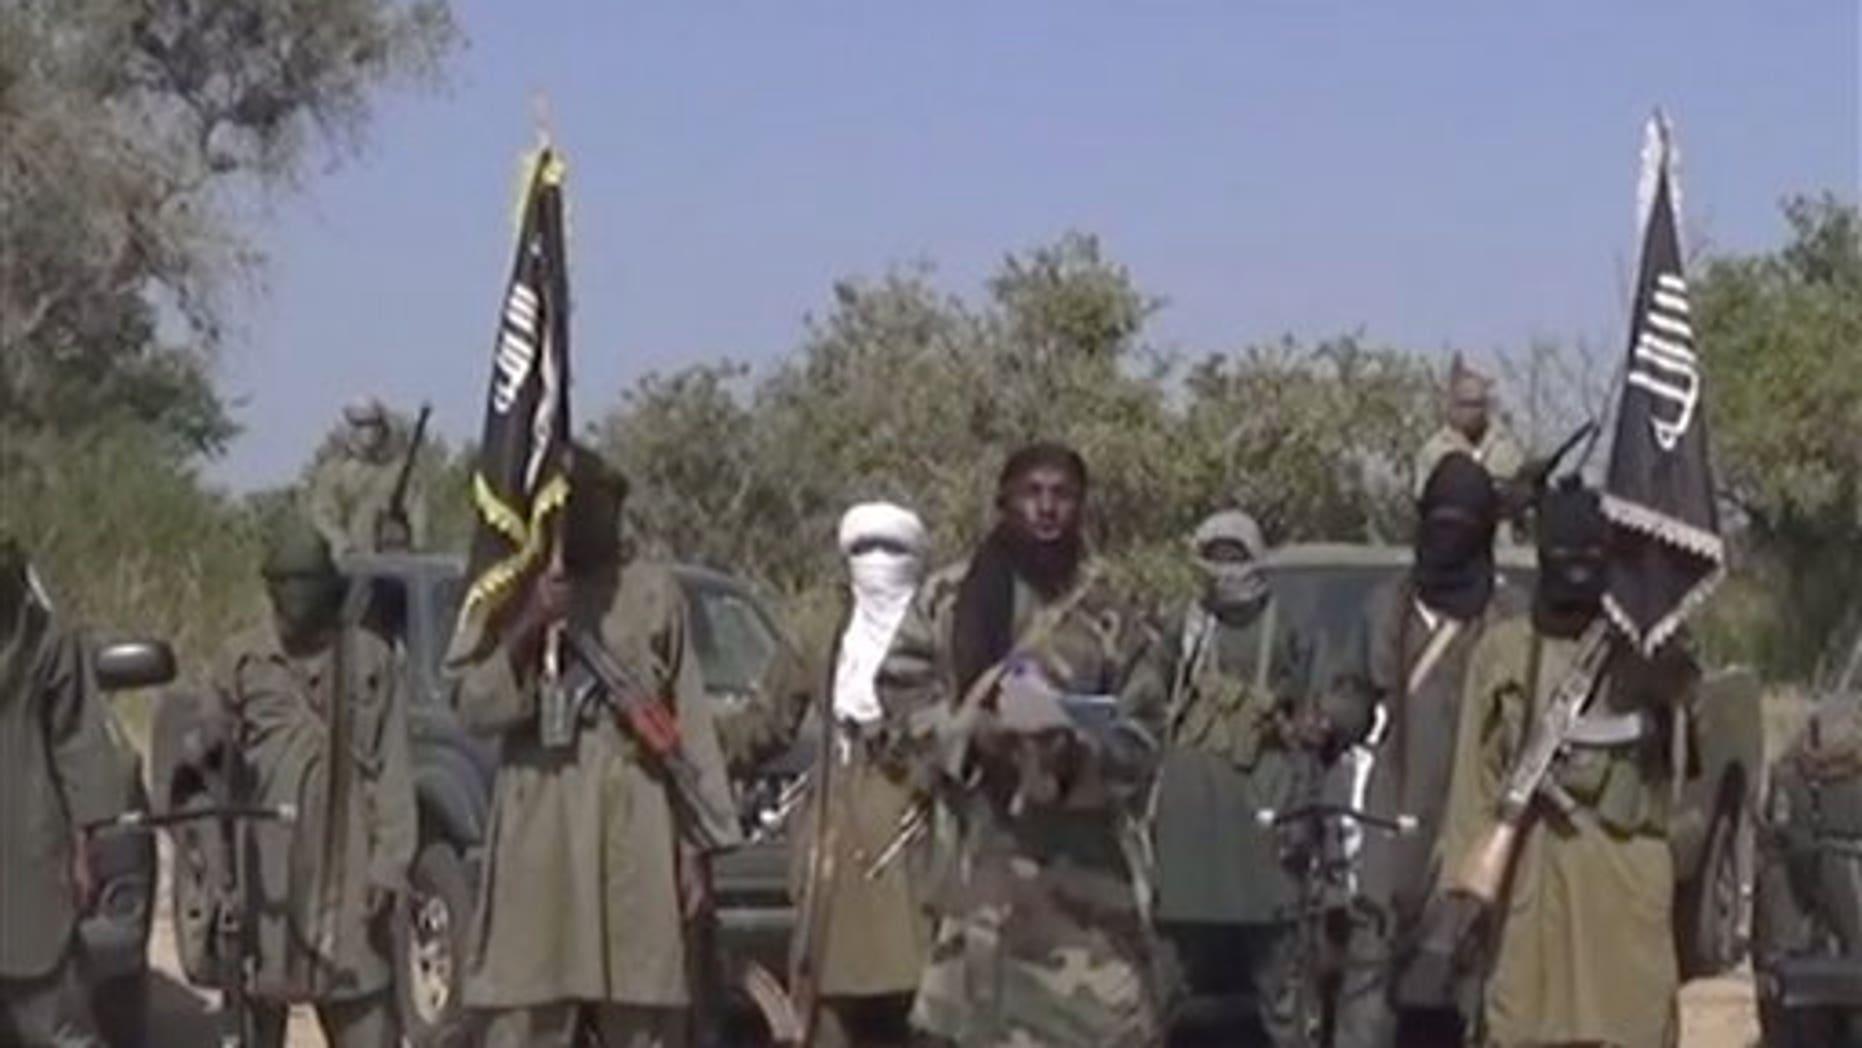 The leader of Boko Haram, Bubakar Shekau.